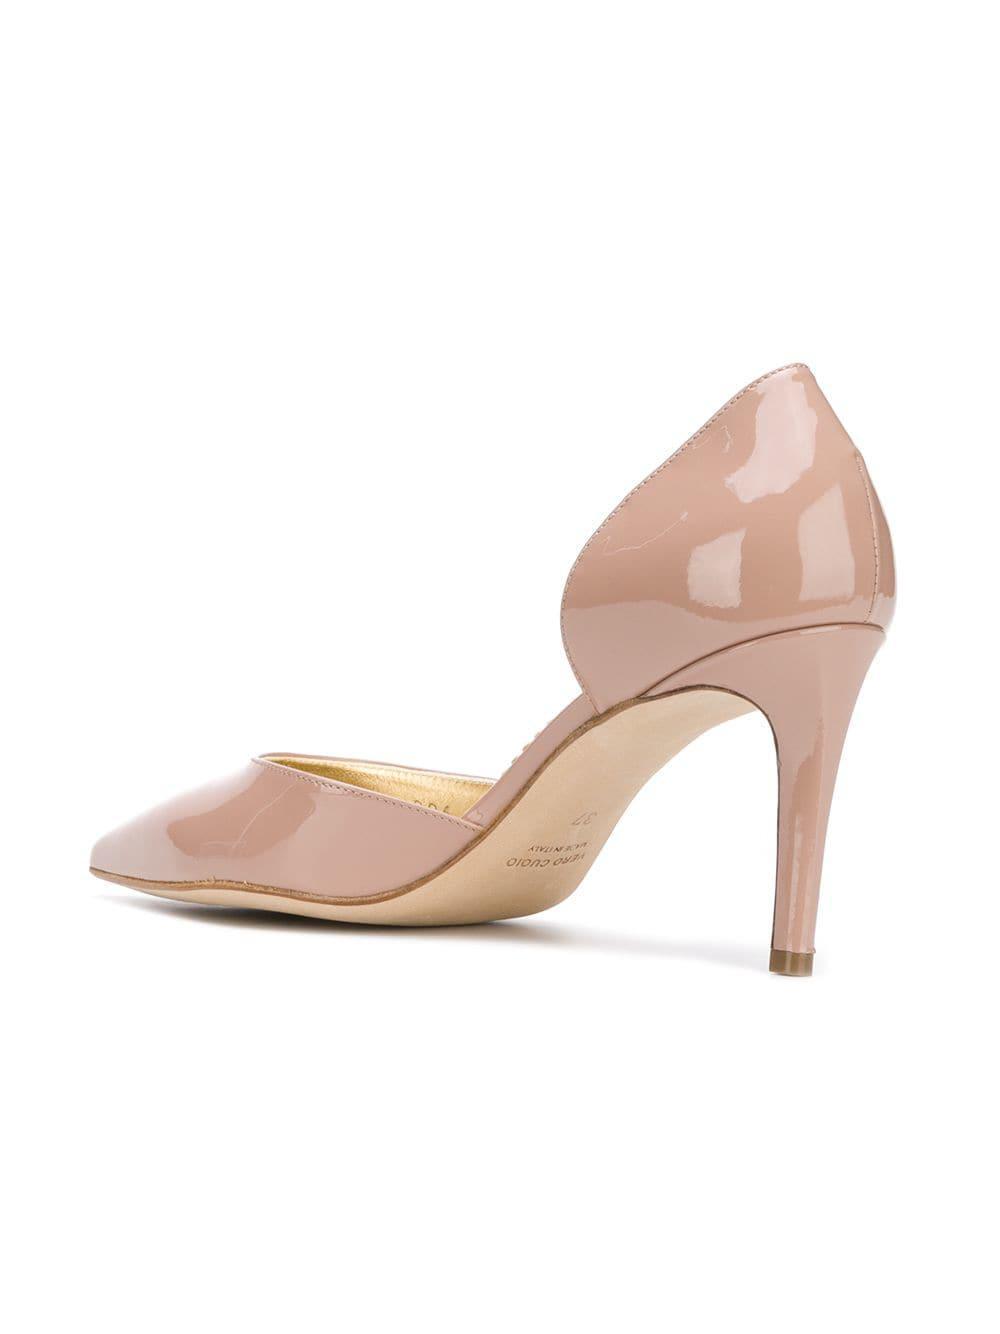 Generous 2019 European Womens Sandals Summer Pu T-strap Women Chunky Heels Fashion Heels Sandals Shoes For Women Ladies-shoes B102 High Heels